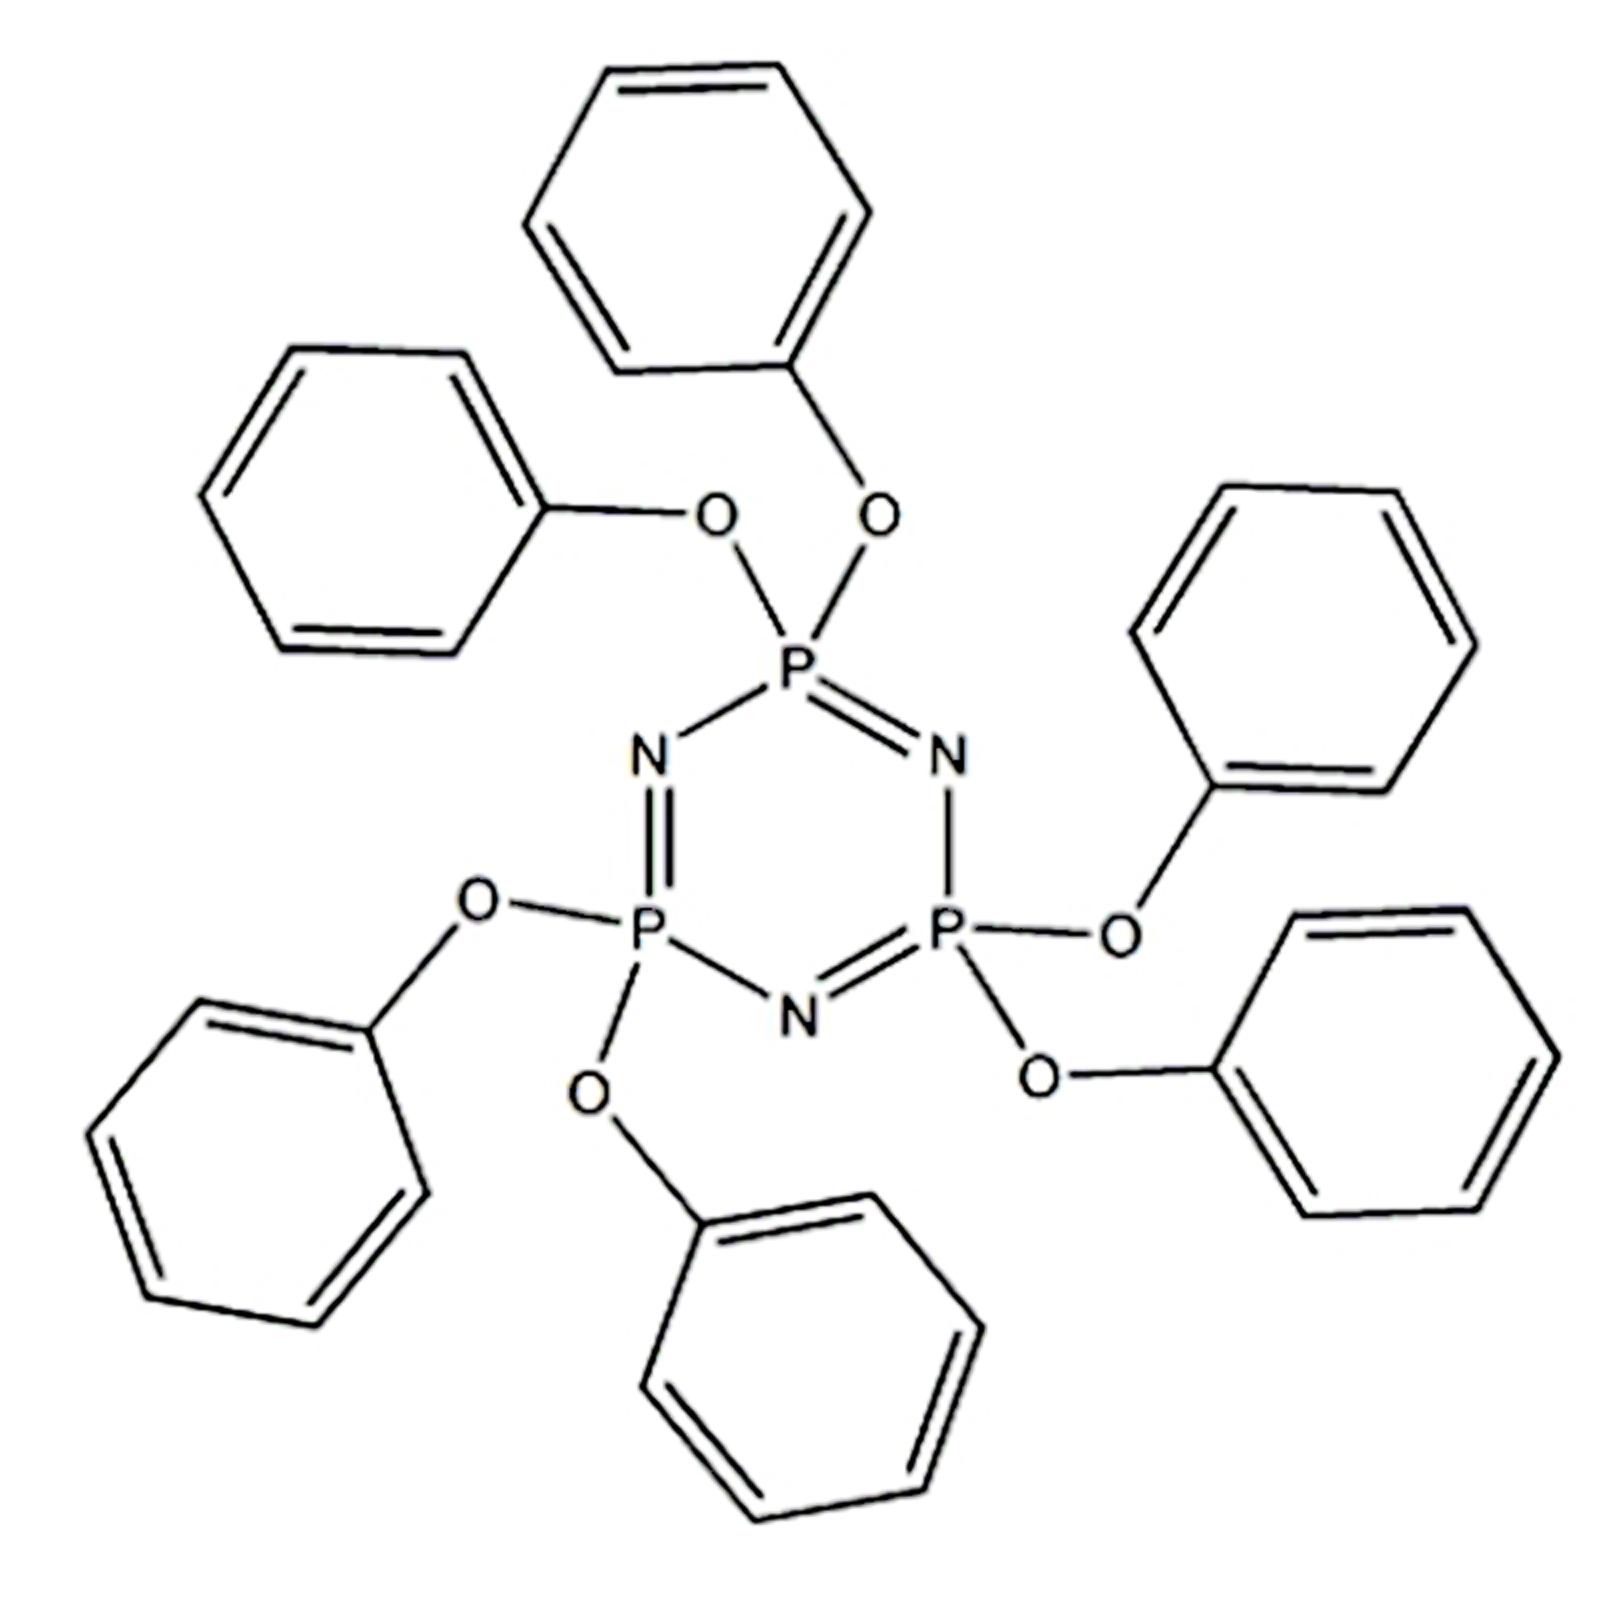 HPCTP, Phenoxy cyclophosphazene, CAS no. 1184-10-7